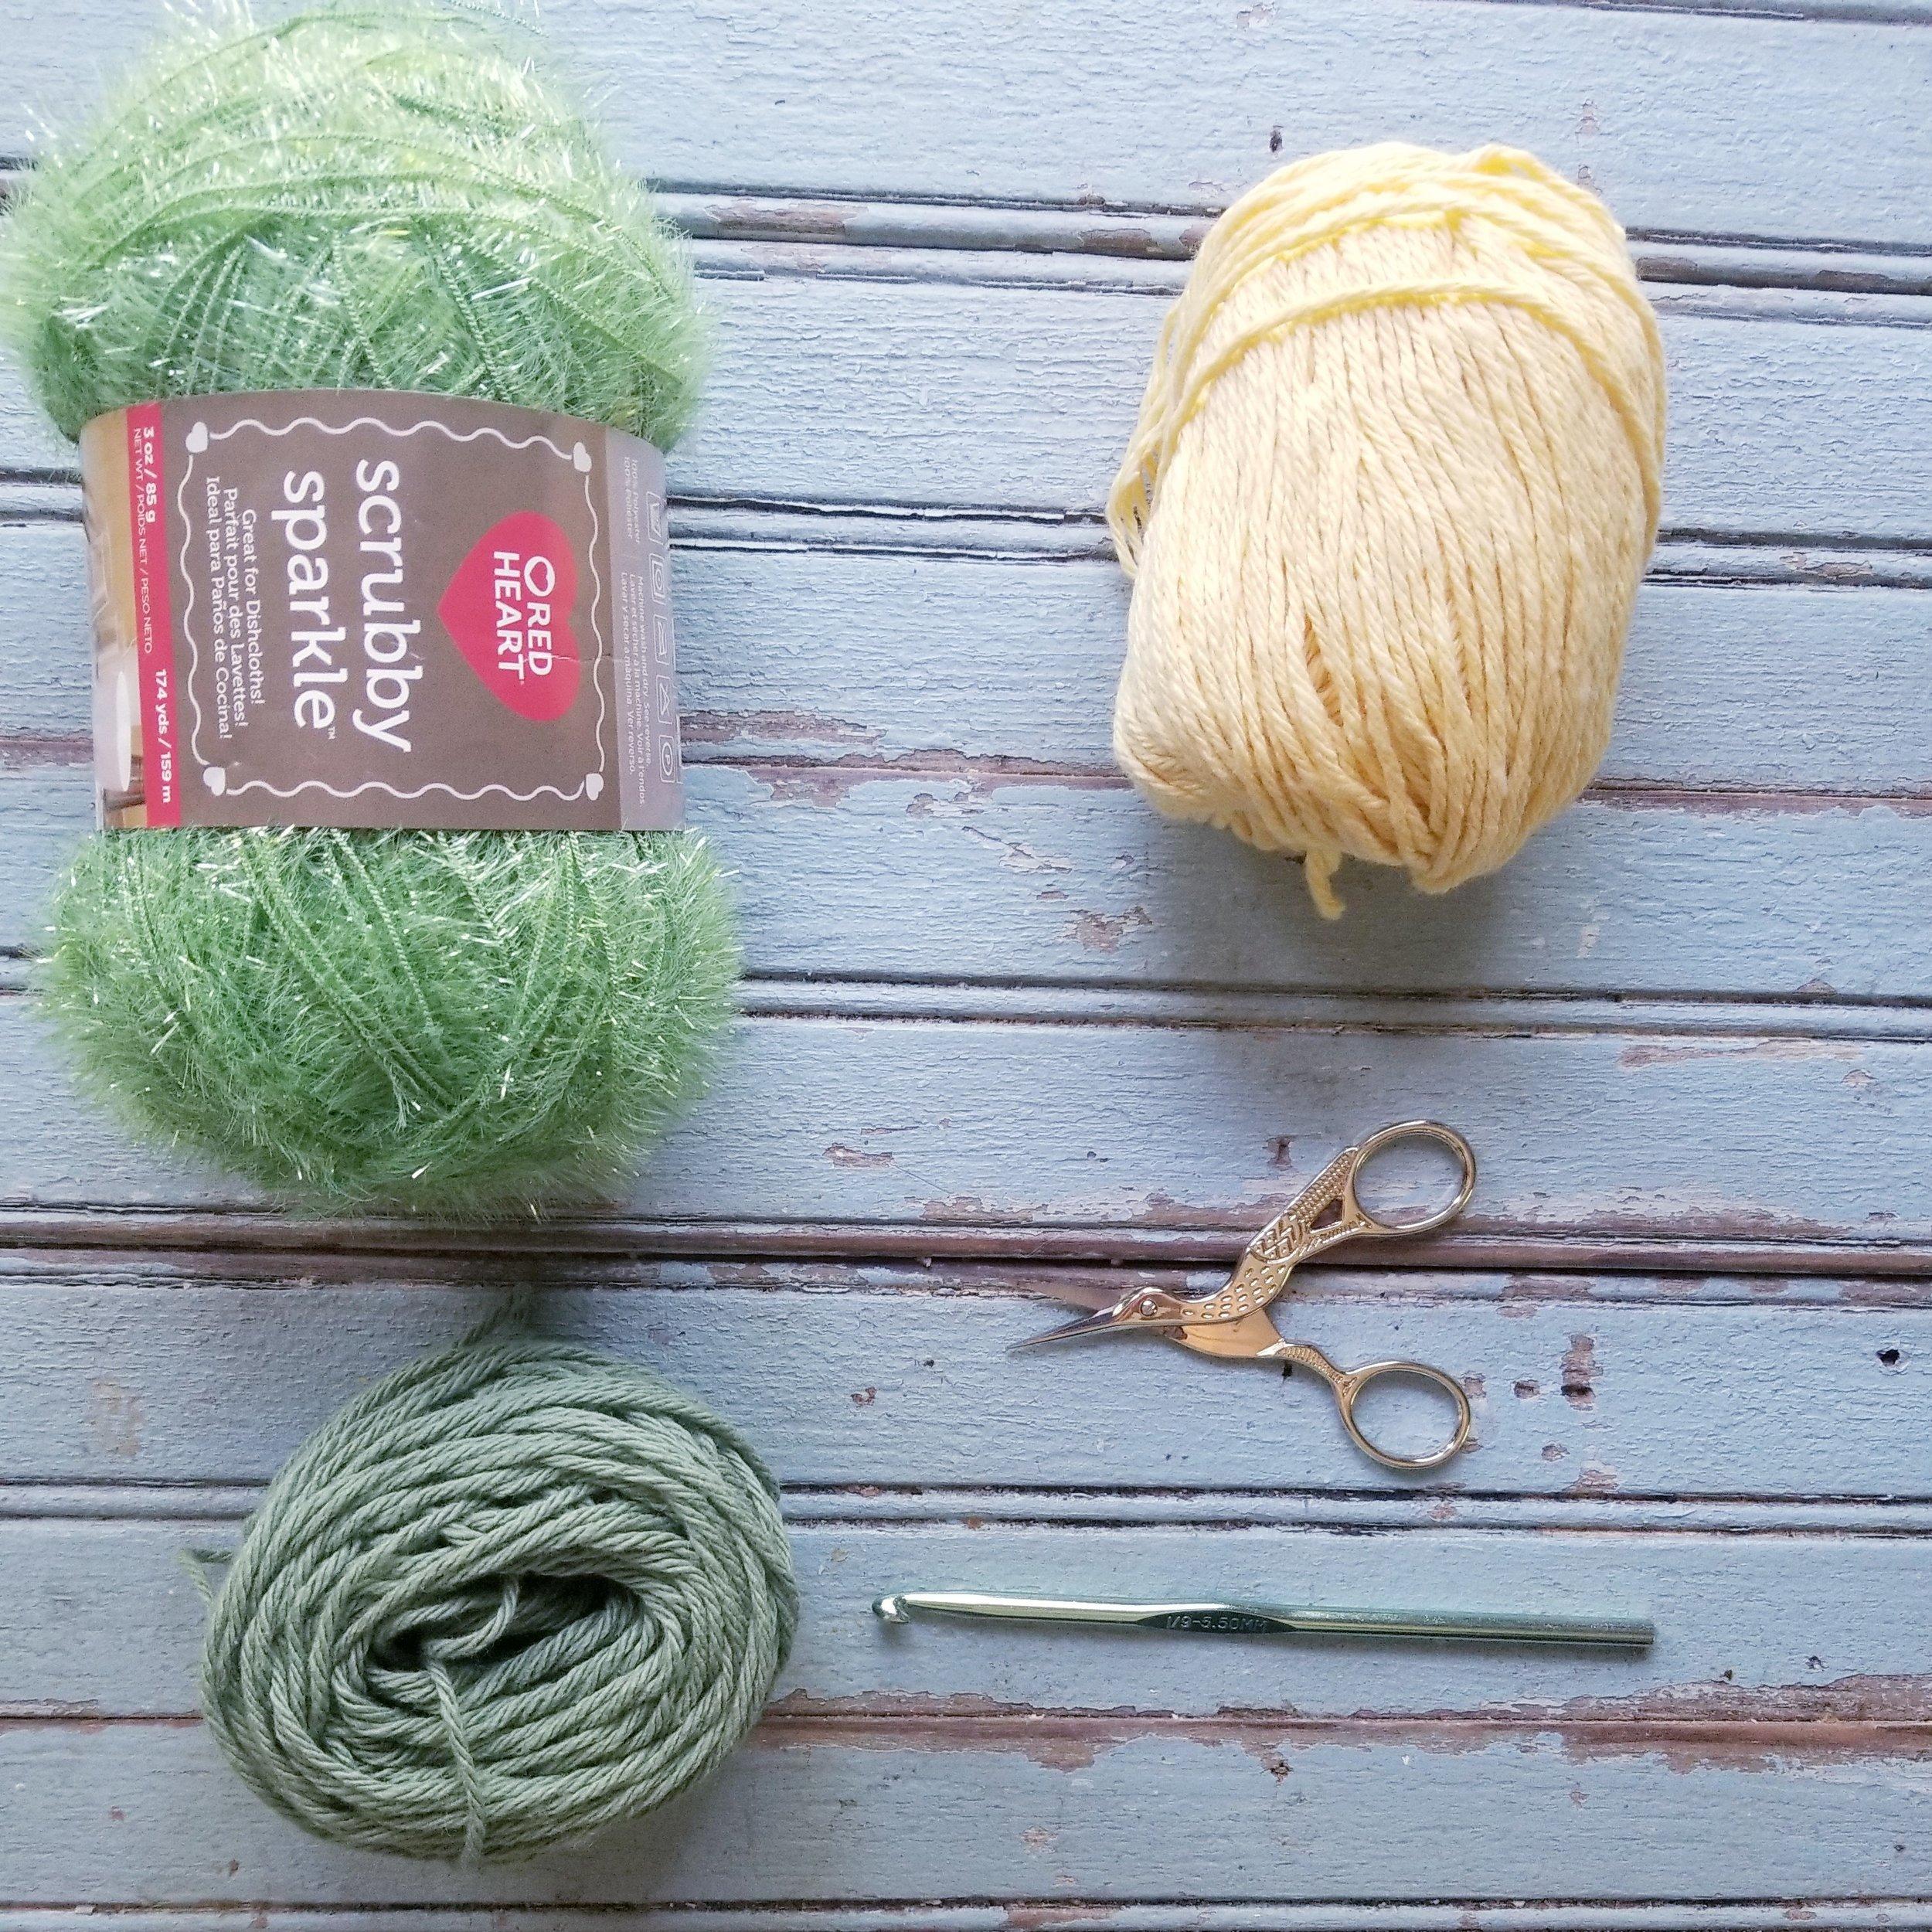 Lemon Dish Scrubby: Free Crochet Pattern